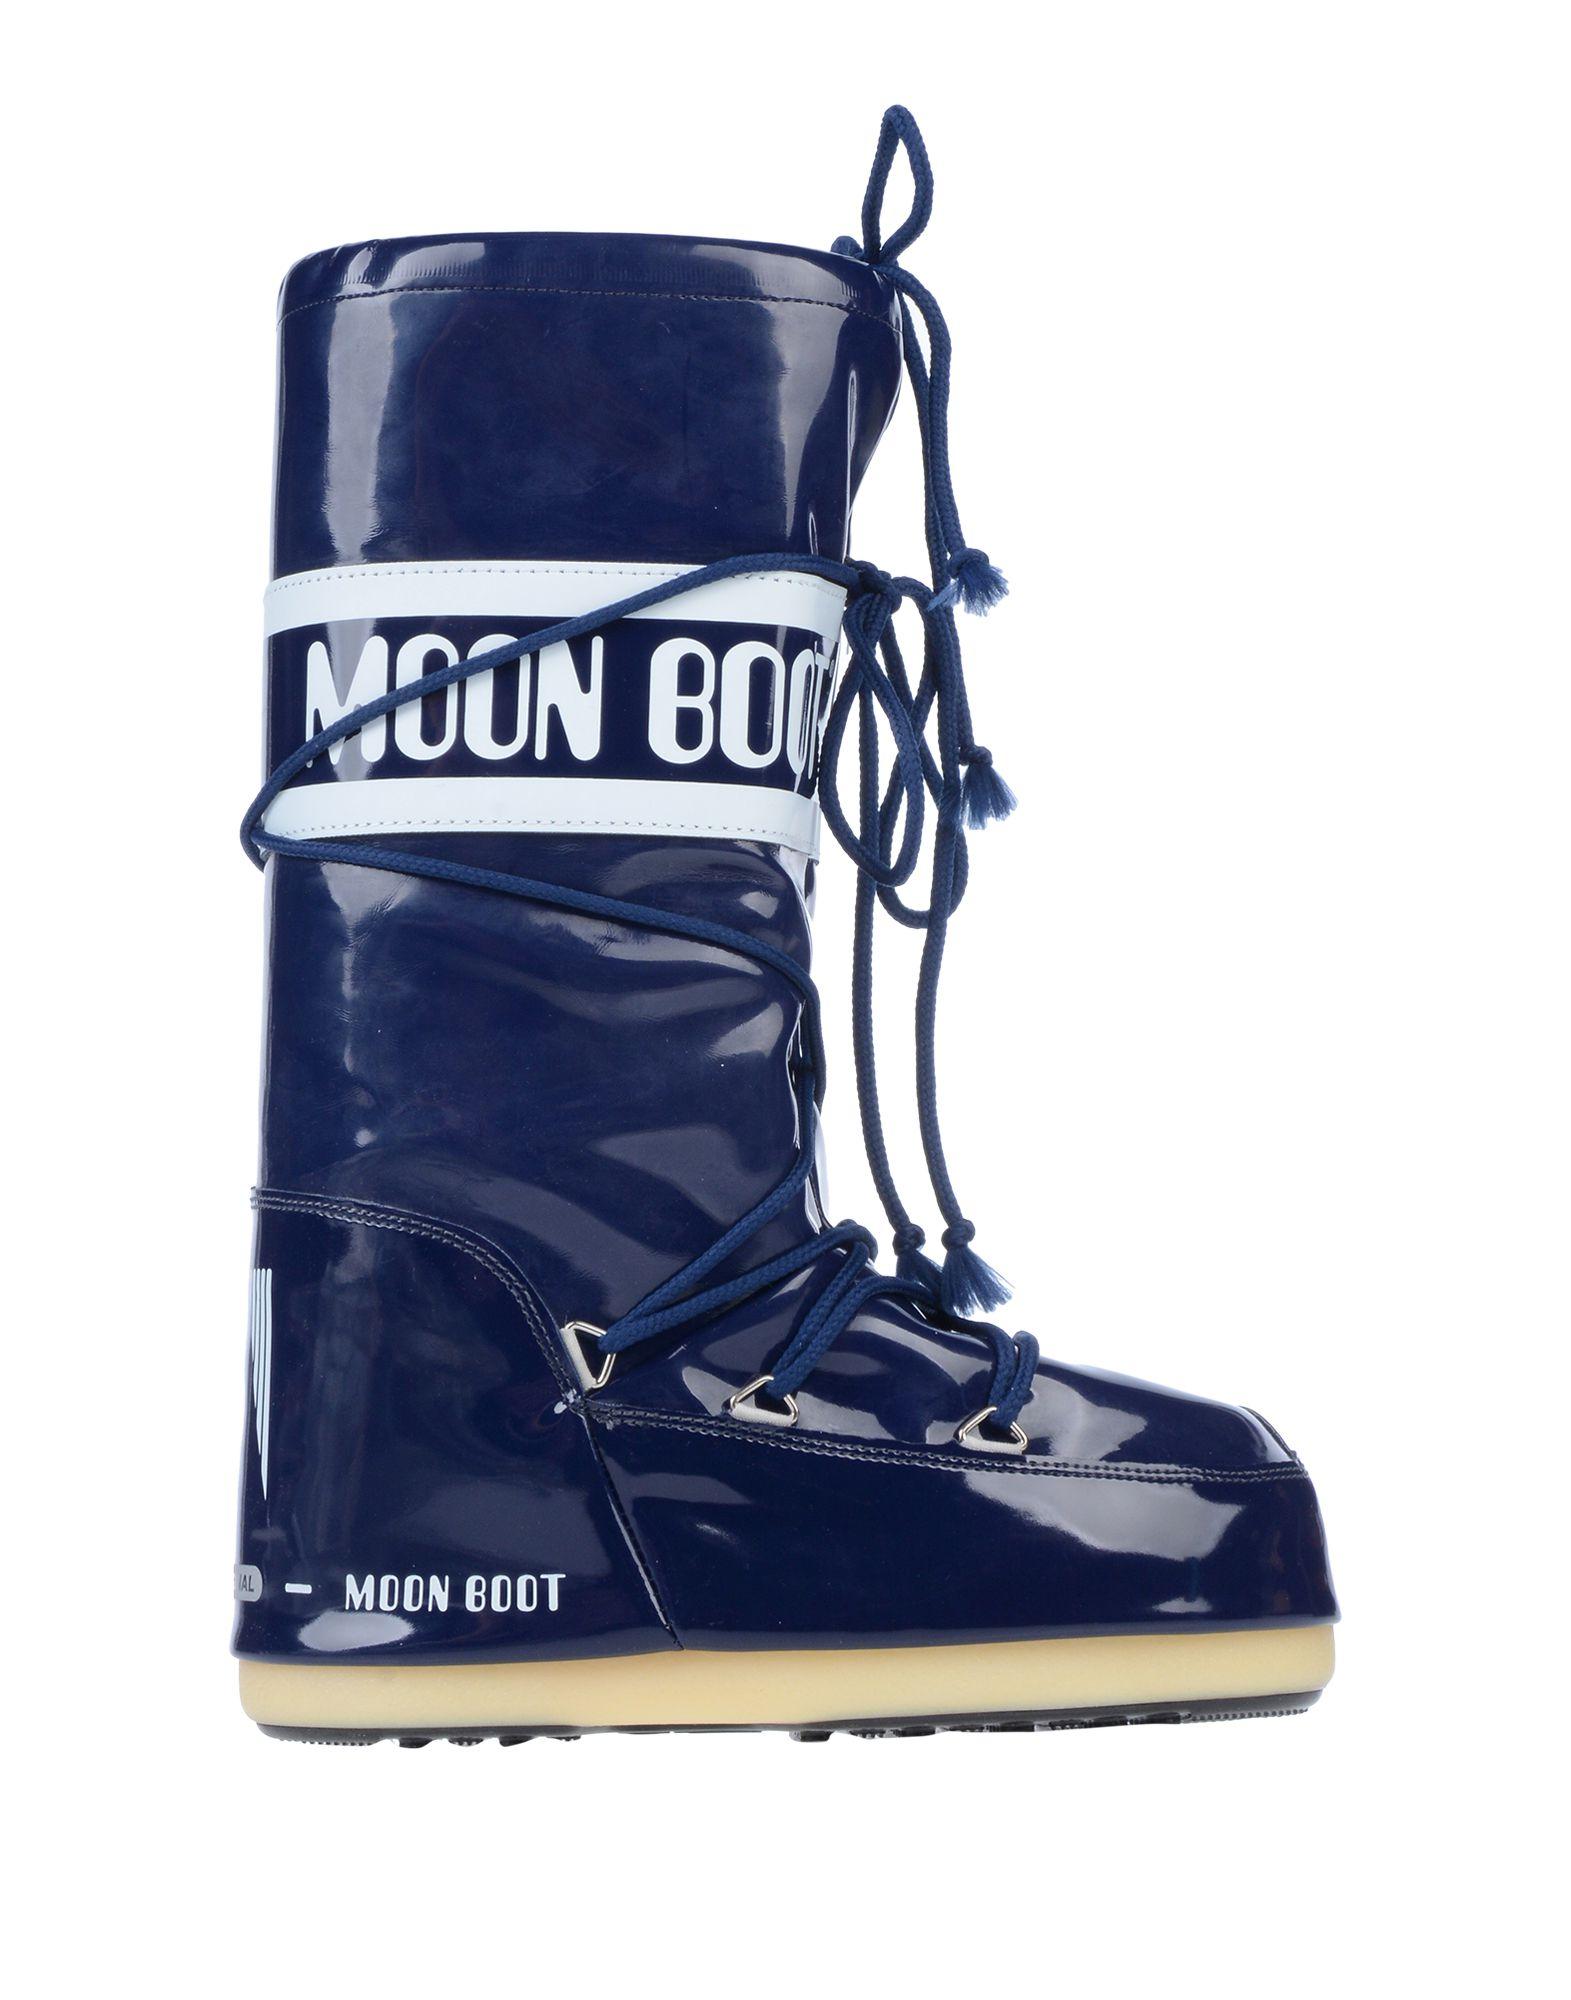 MOON BOOT Сапоги manitobah сапоги okotoks grain boot женские коричневый